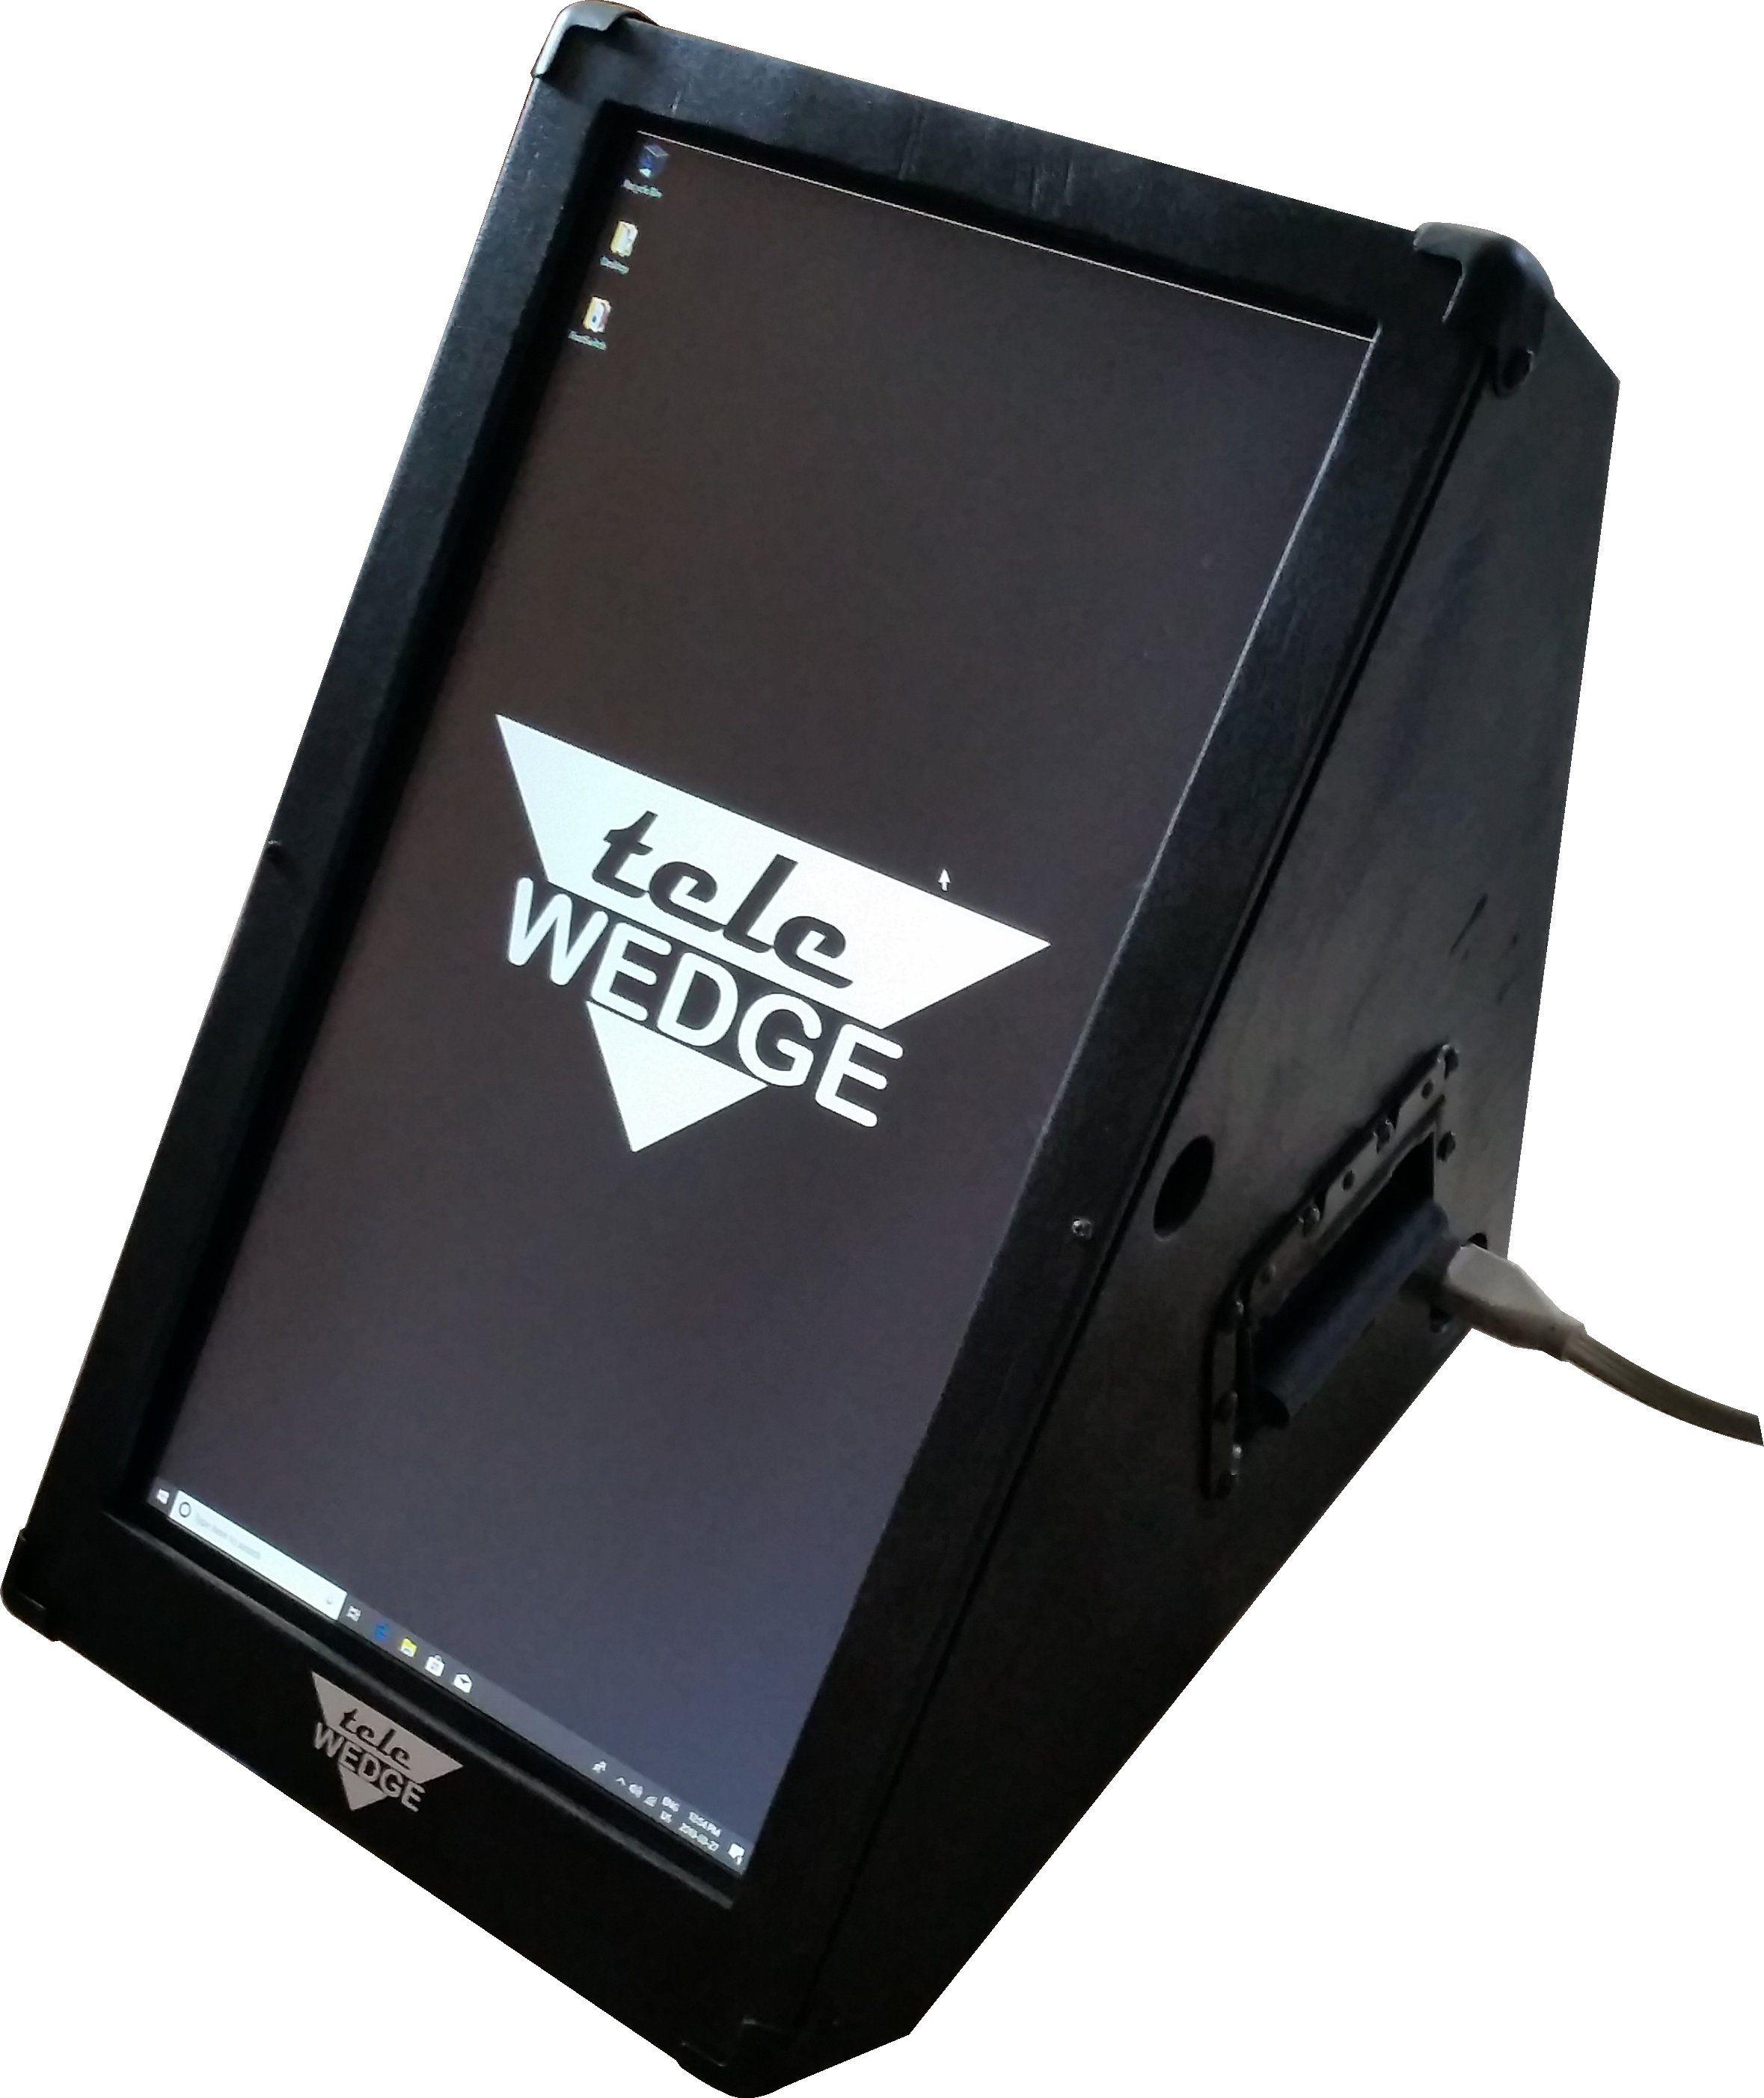 TeleWedge Lyric Teleprompter for iPad AND Samsung users